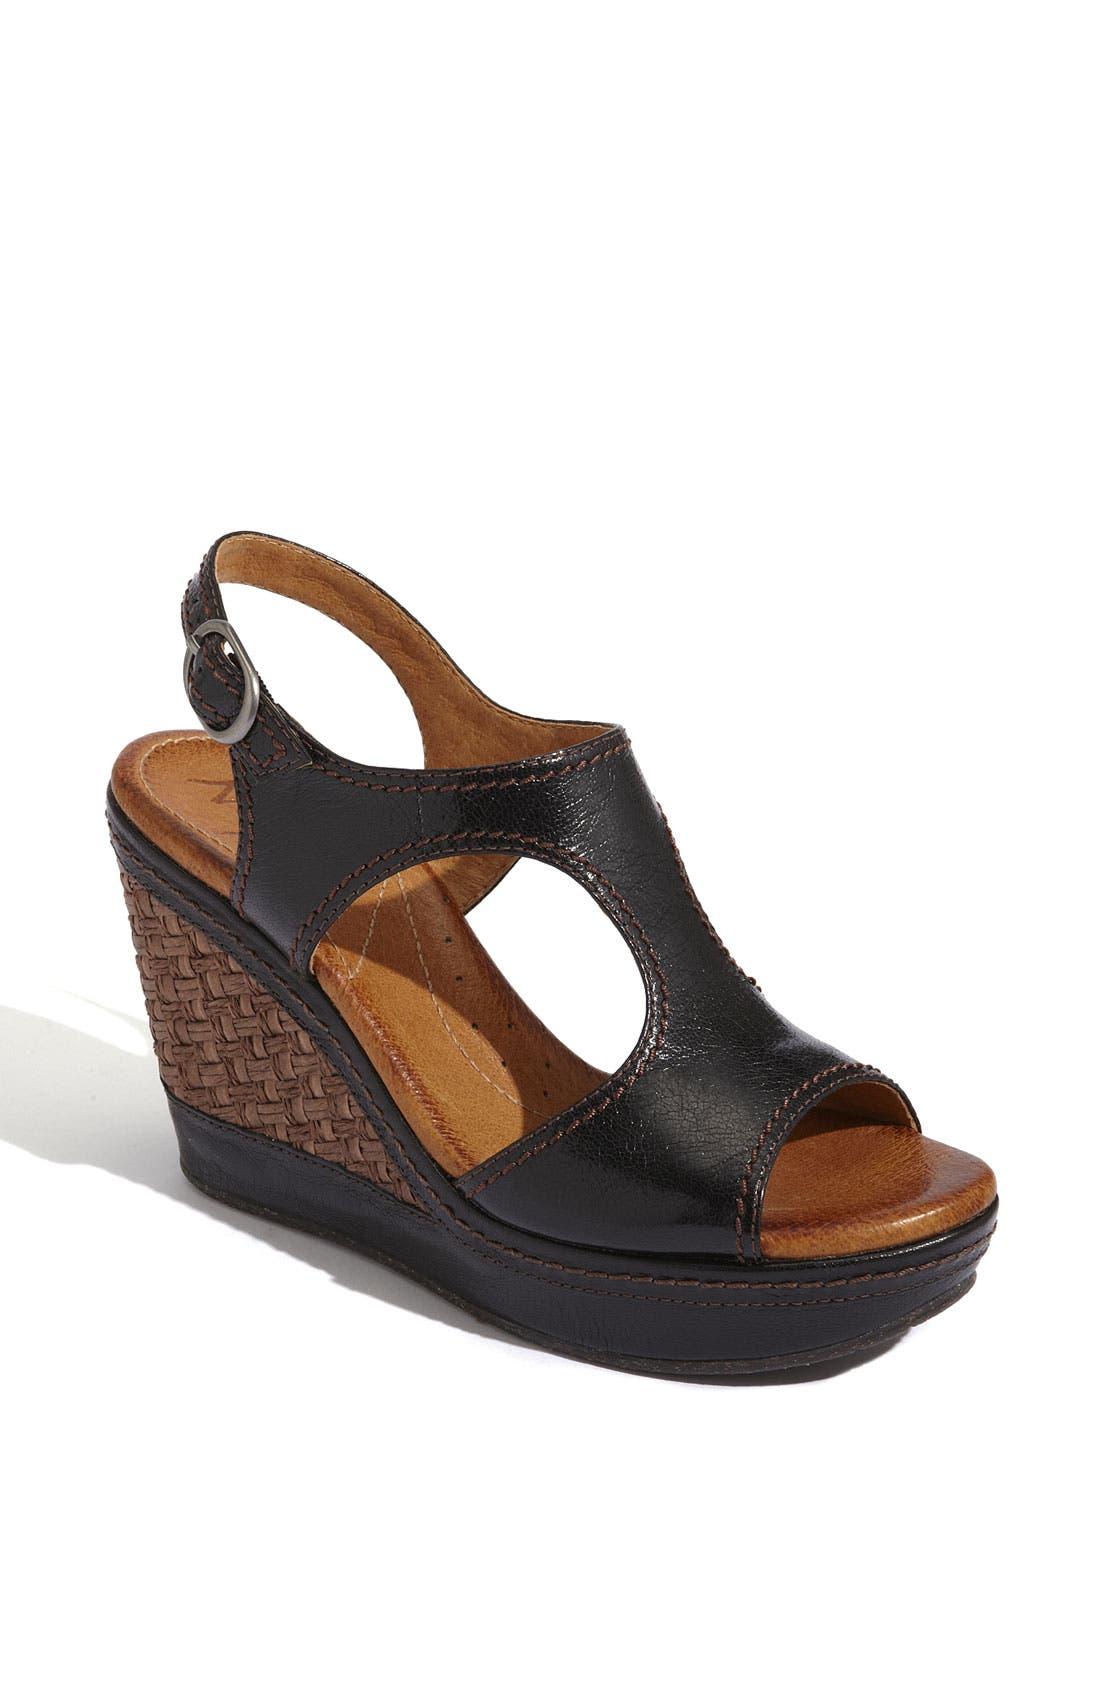 Alternate Image 1 Selected - Naya 'Eternal' Sandal